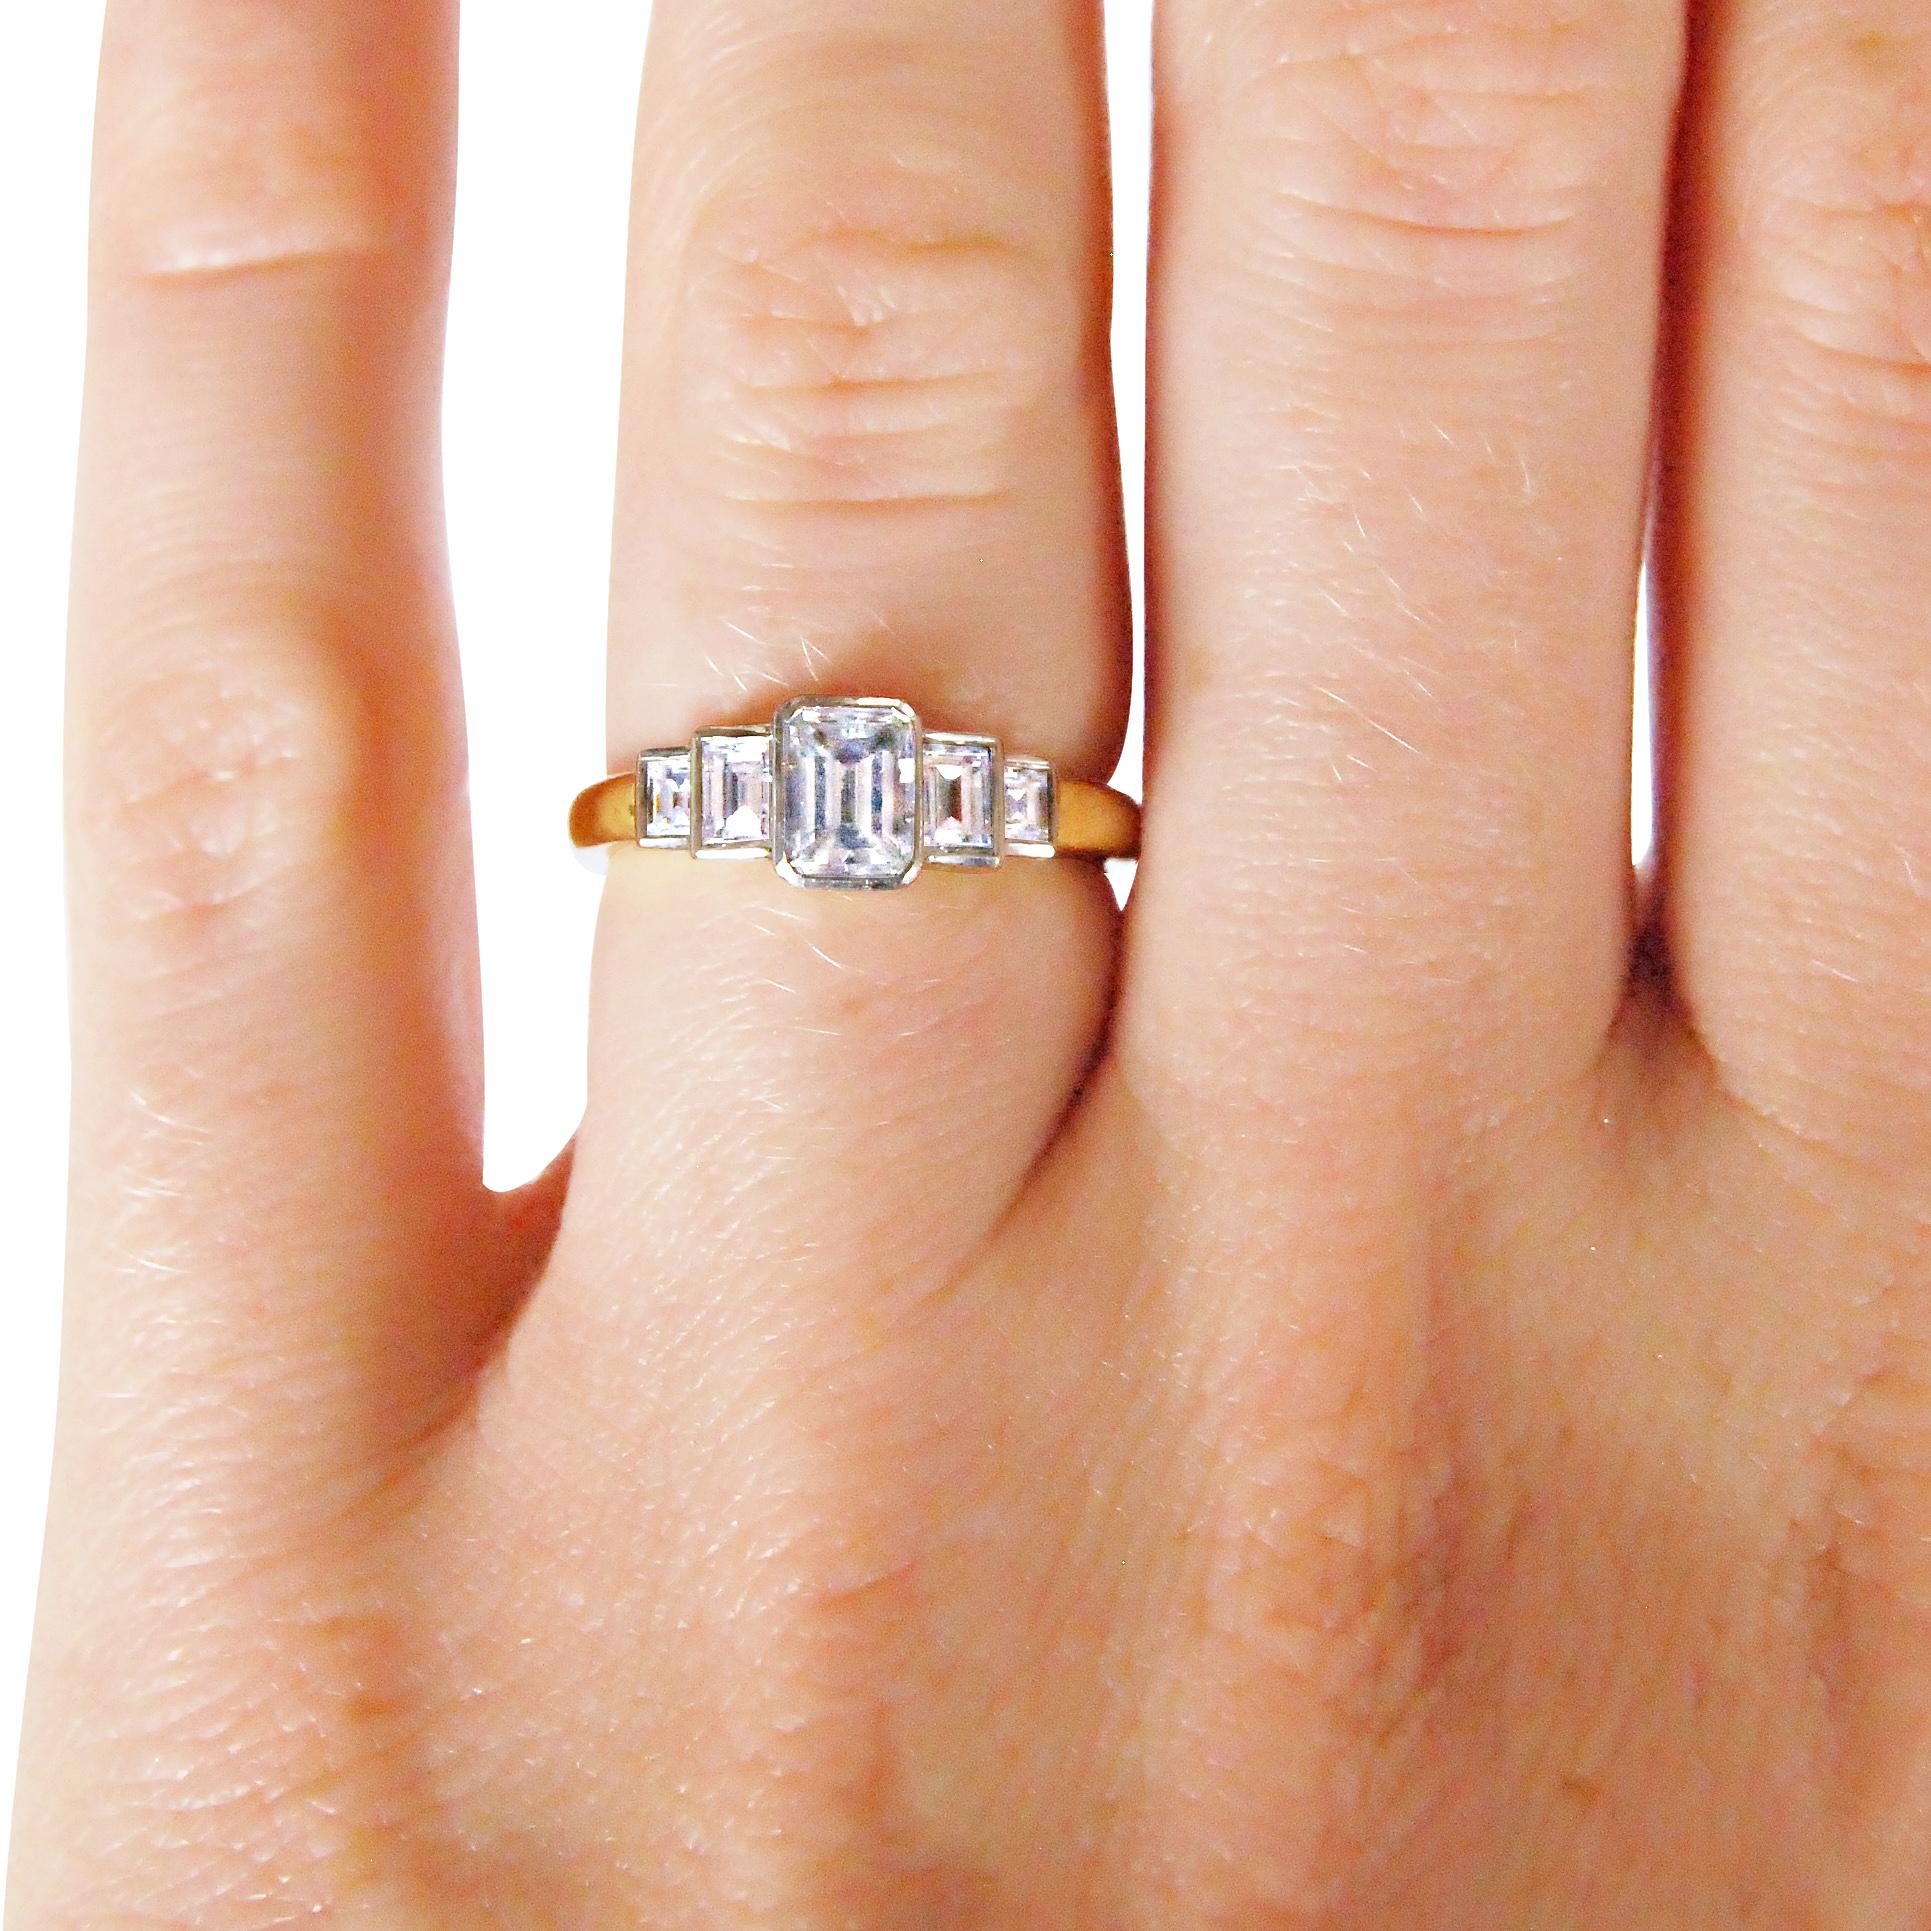 Vintage emerald-cut diamond five-stone ring hand shot